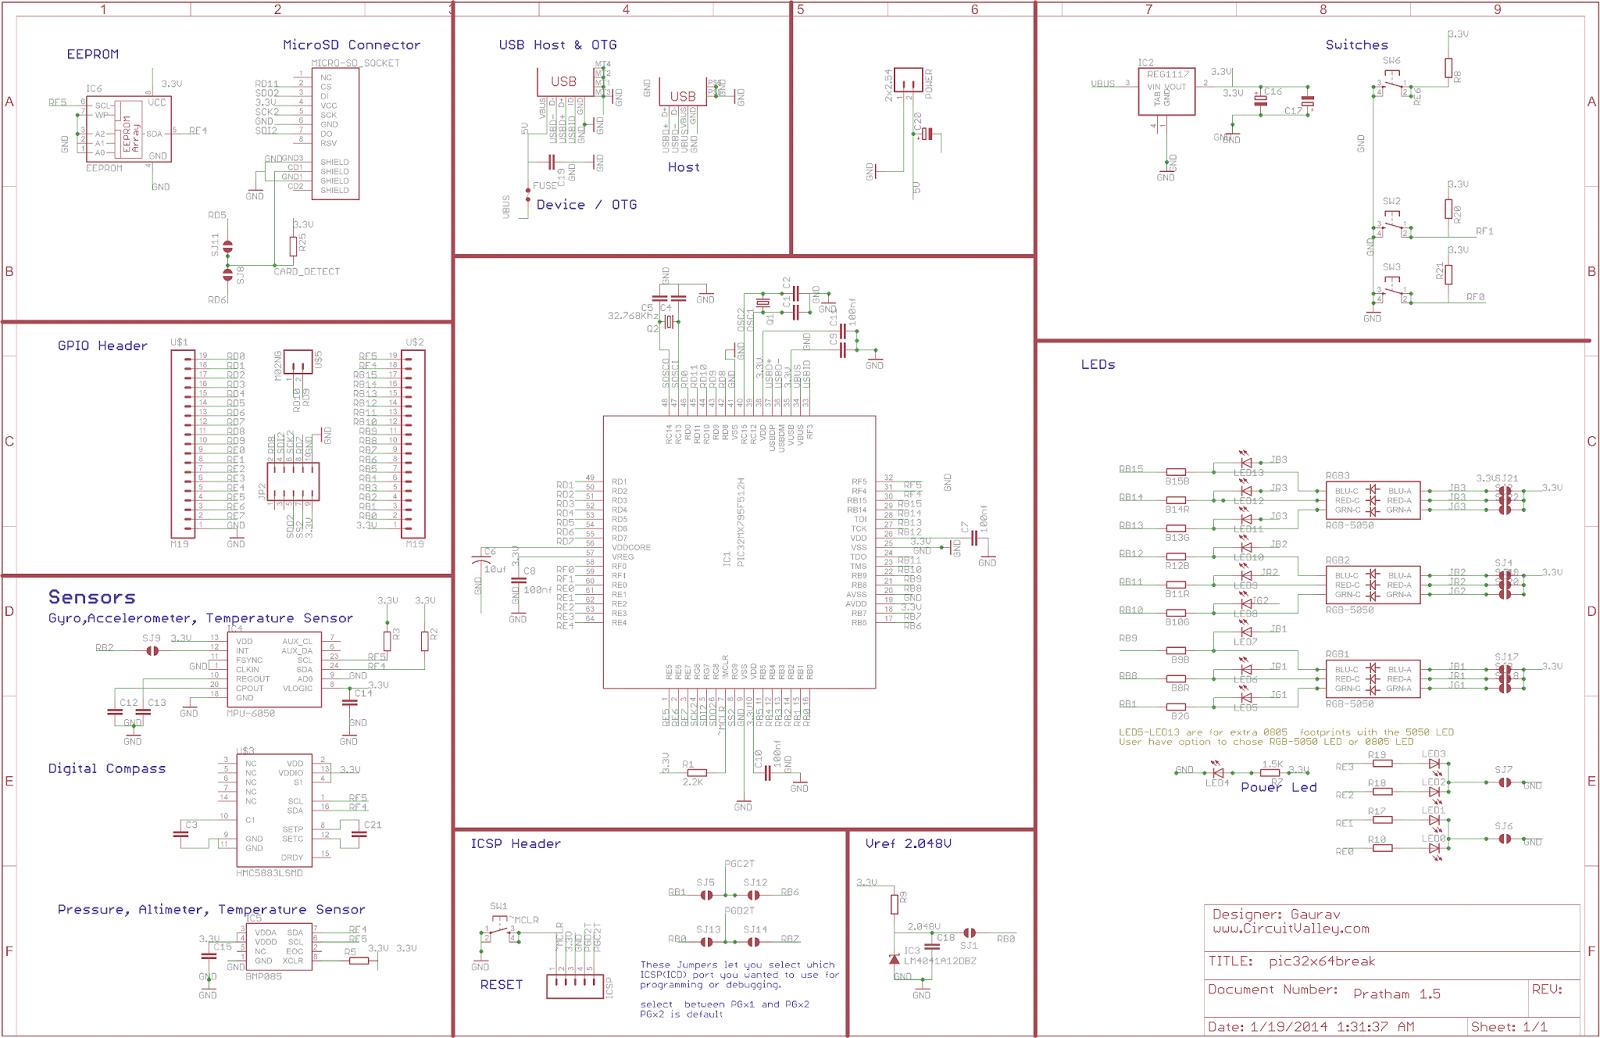 Pratham: Breadboardable PIC32 Breakout/Development Board With USB OTG , USB/SDCard/UART Bootloader 14